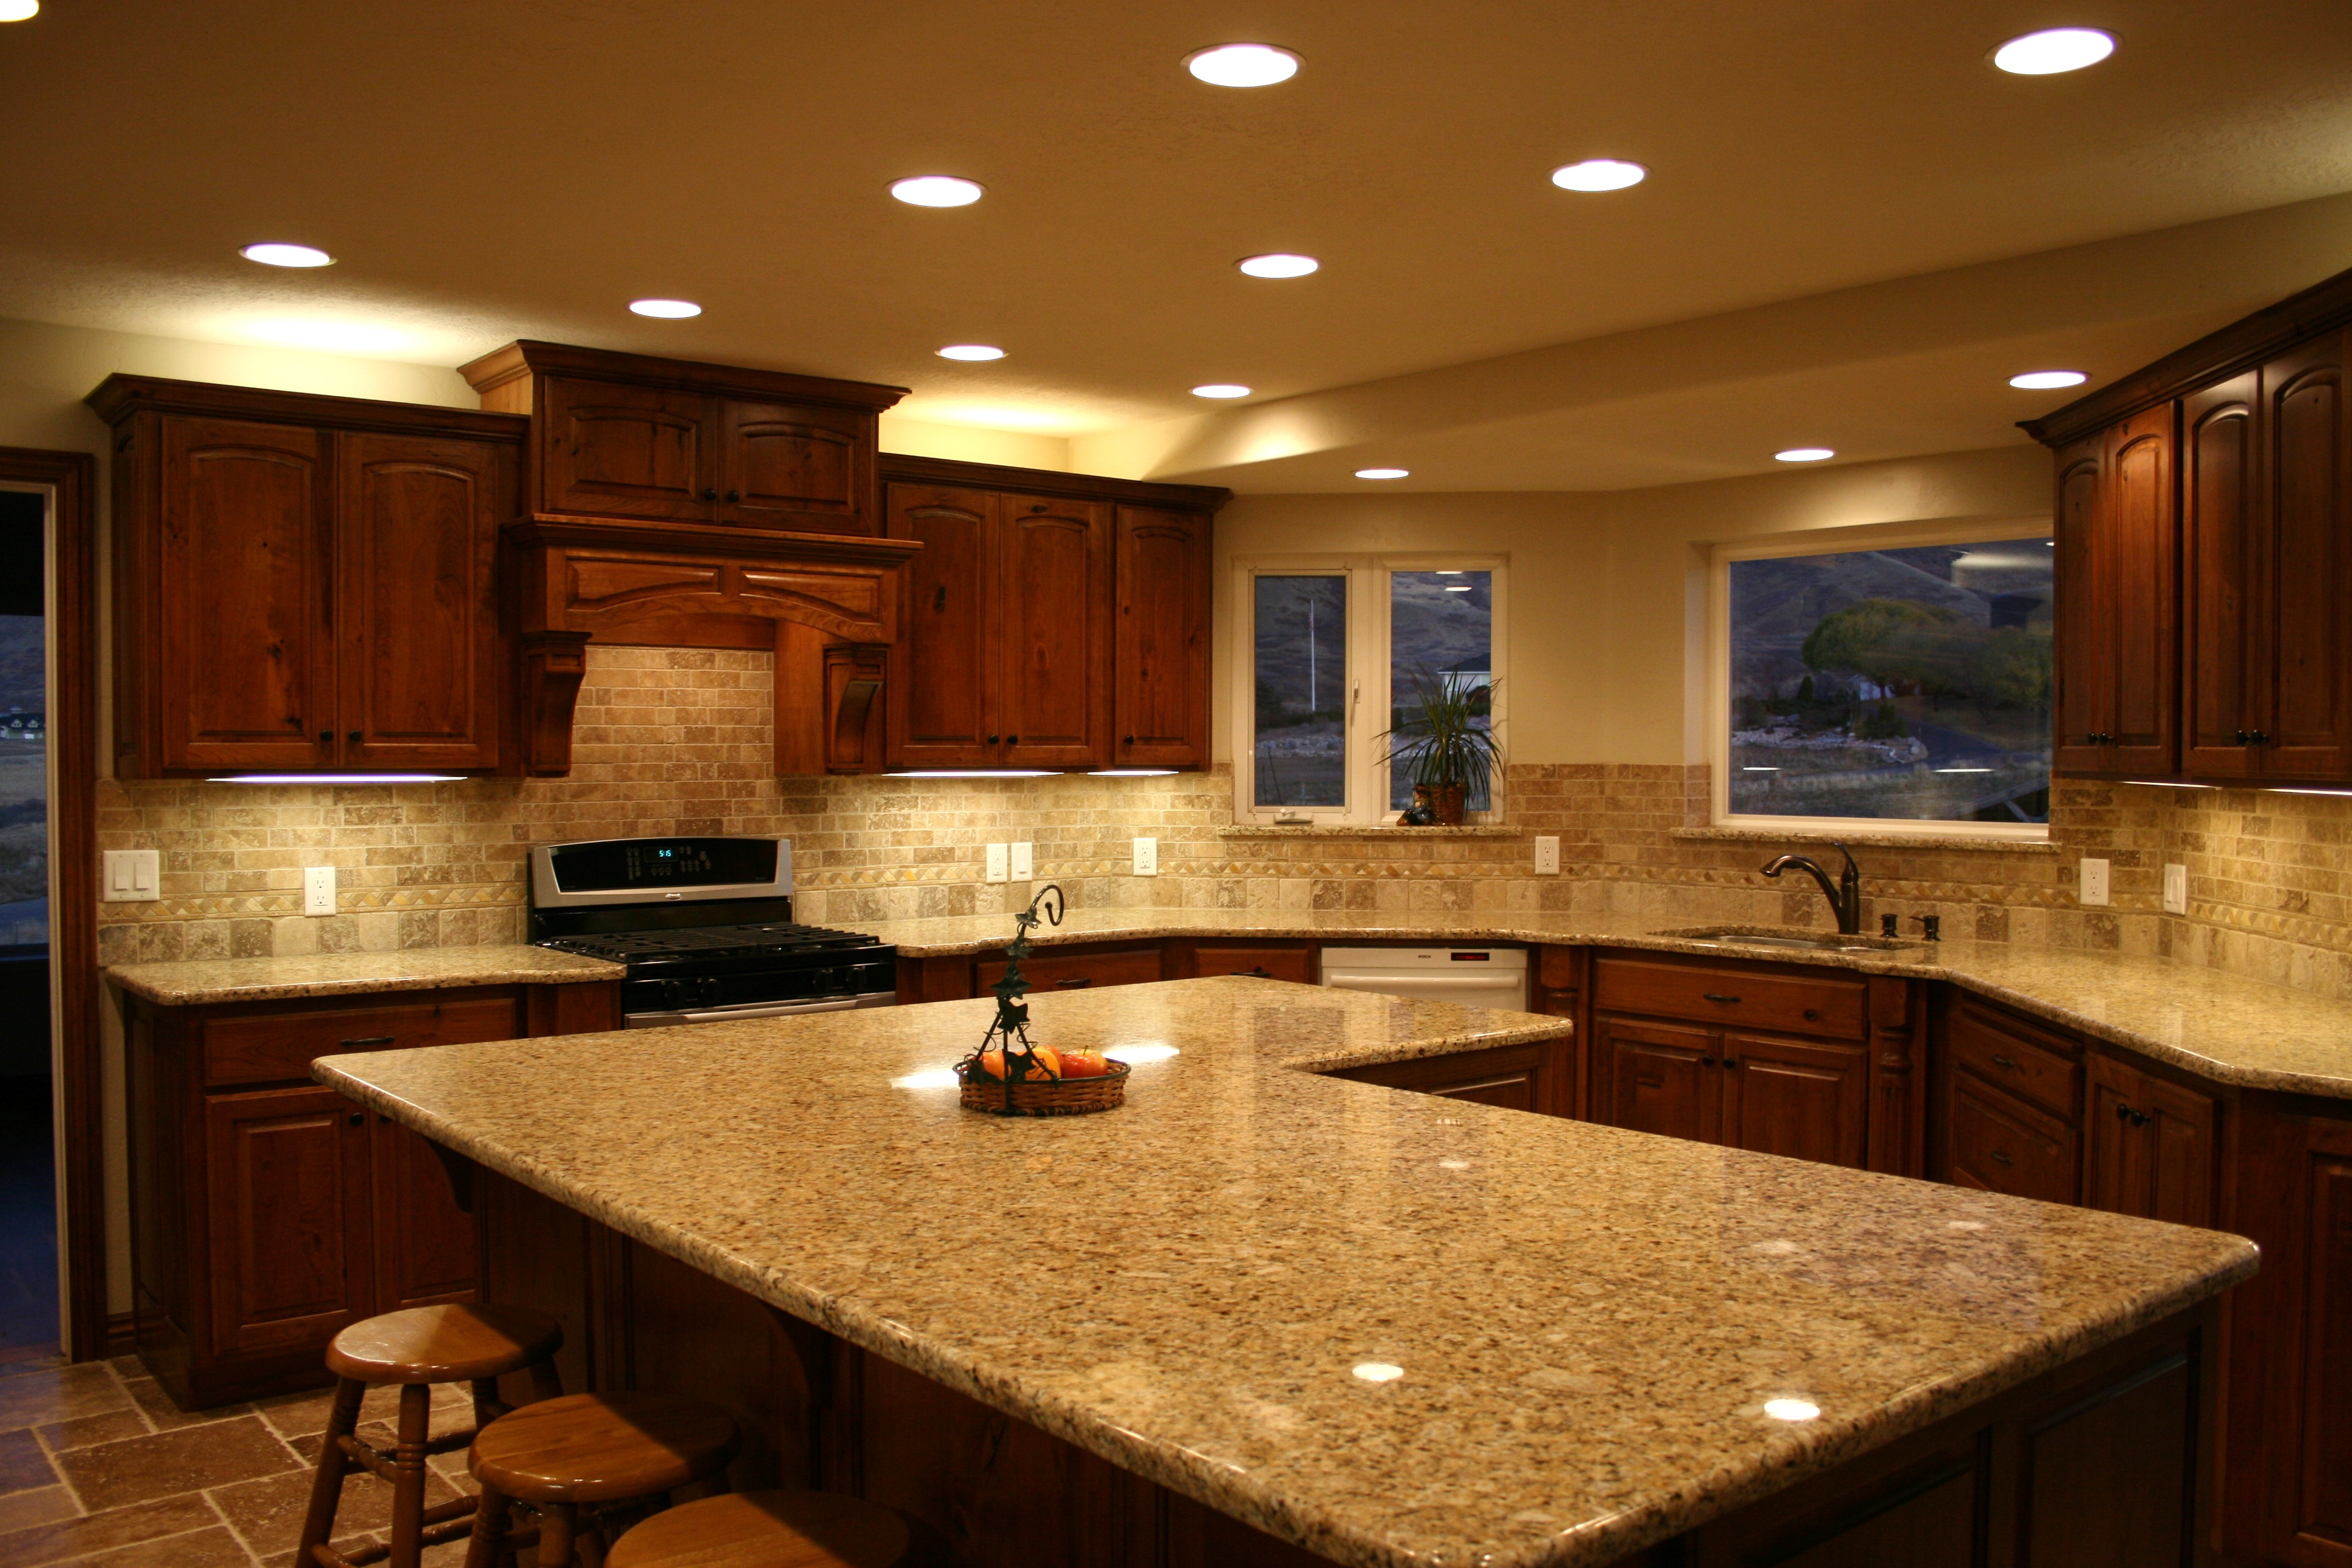 20 kitchen countertop materials kitchen countertop materials granite countertops in kitchens pictures itkb3sed